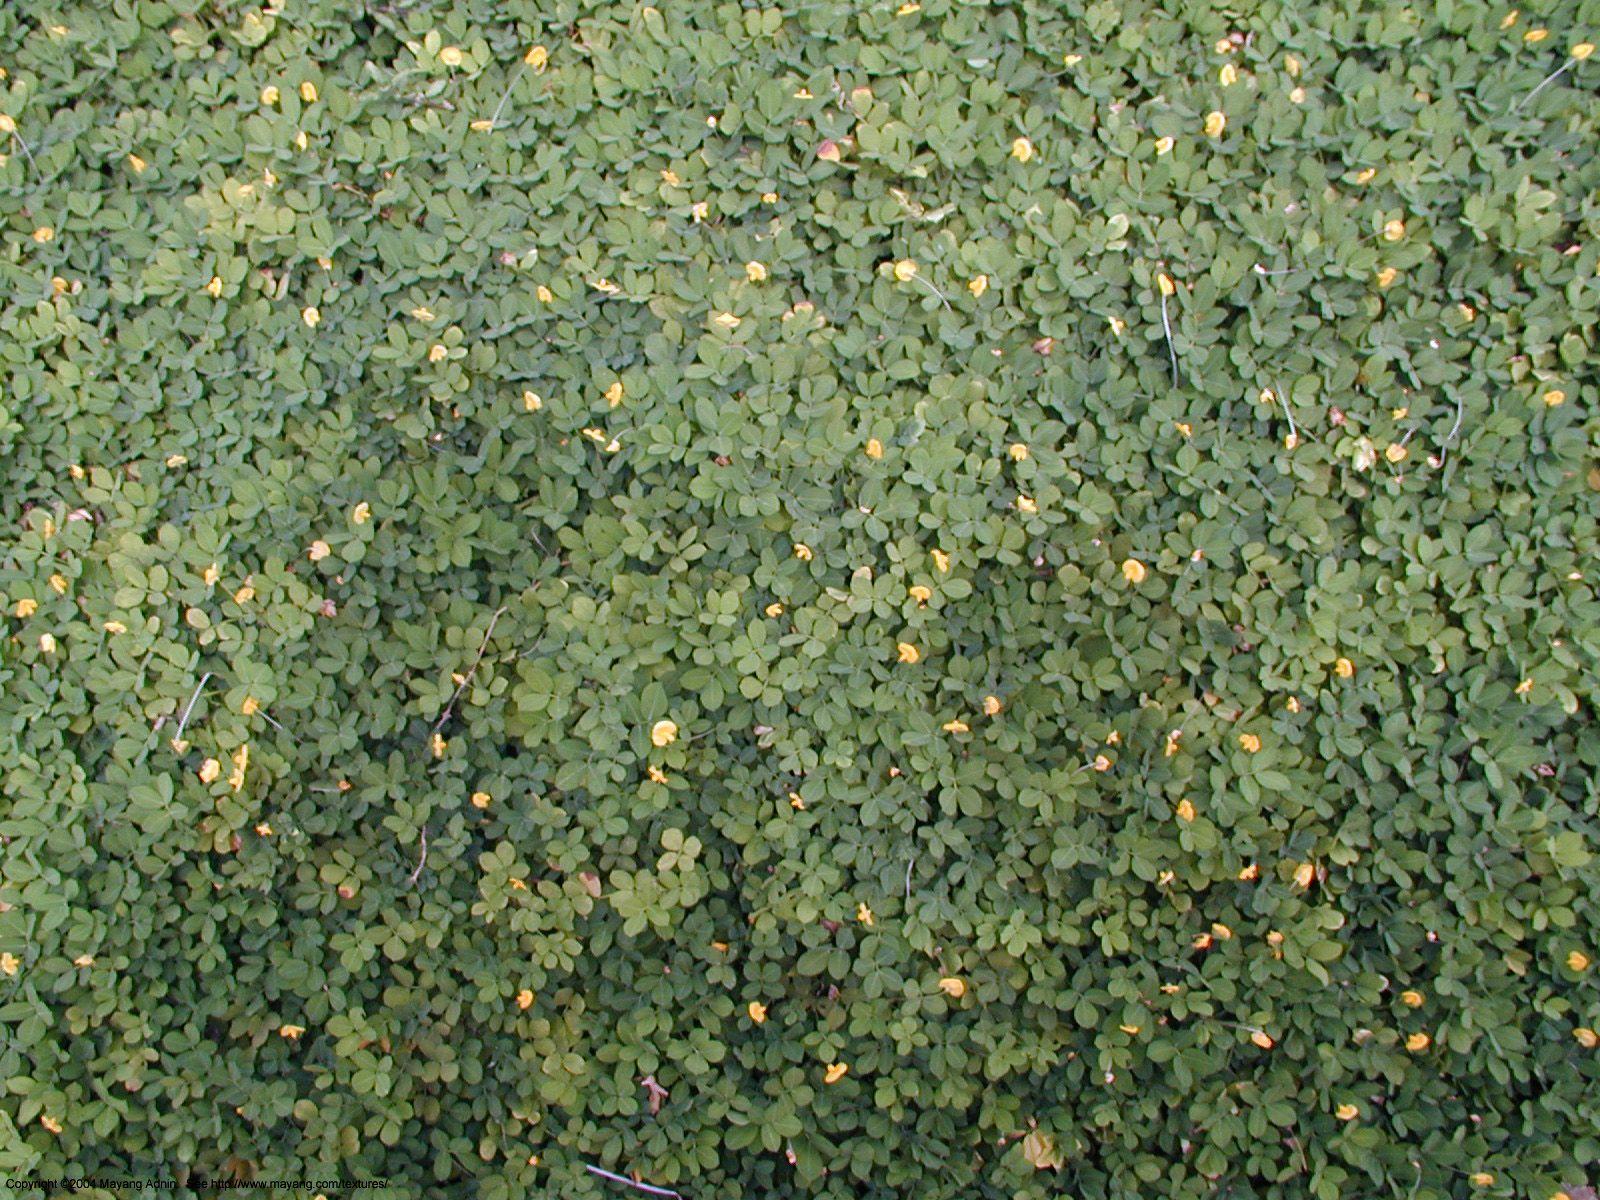 Mayang s Textures Plants Repetitive Plants Textures